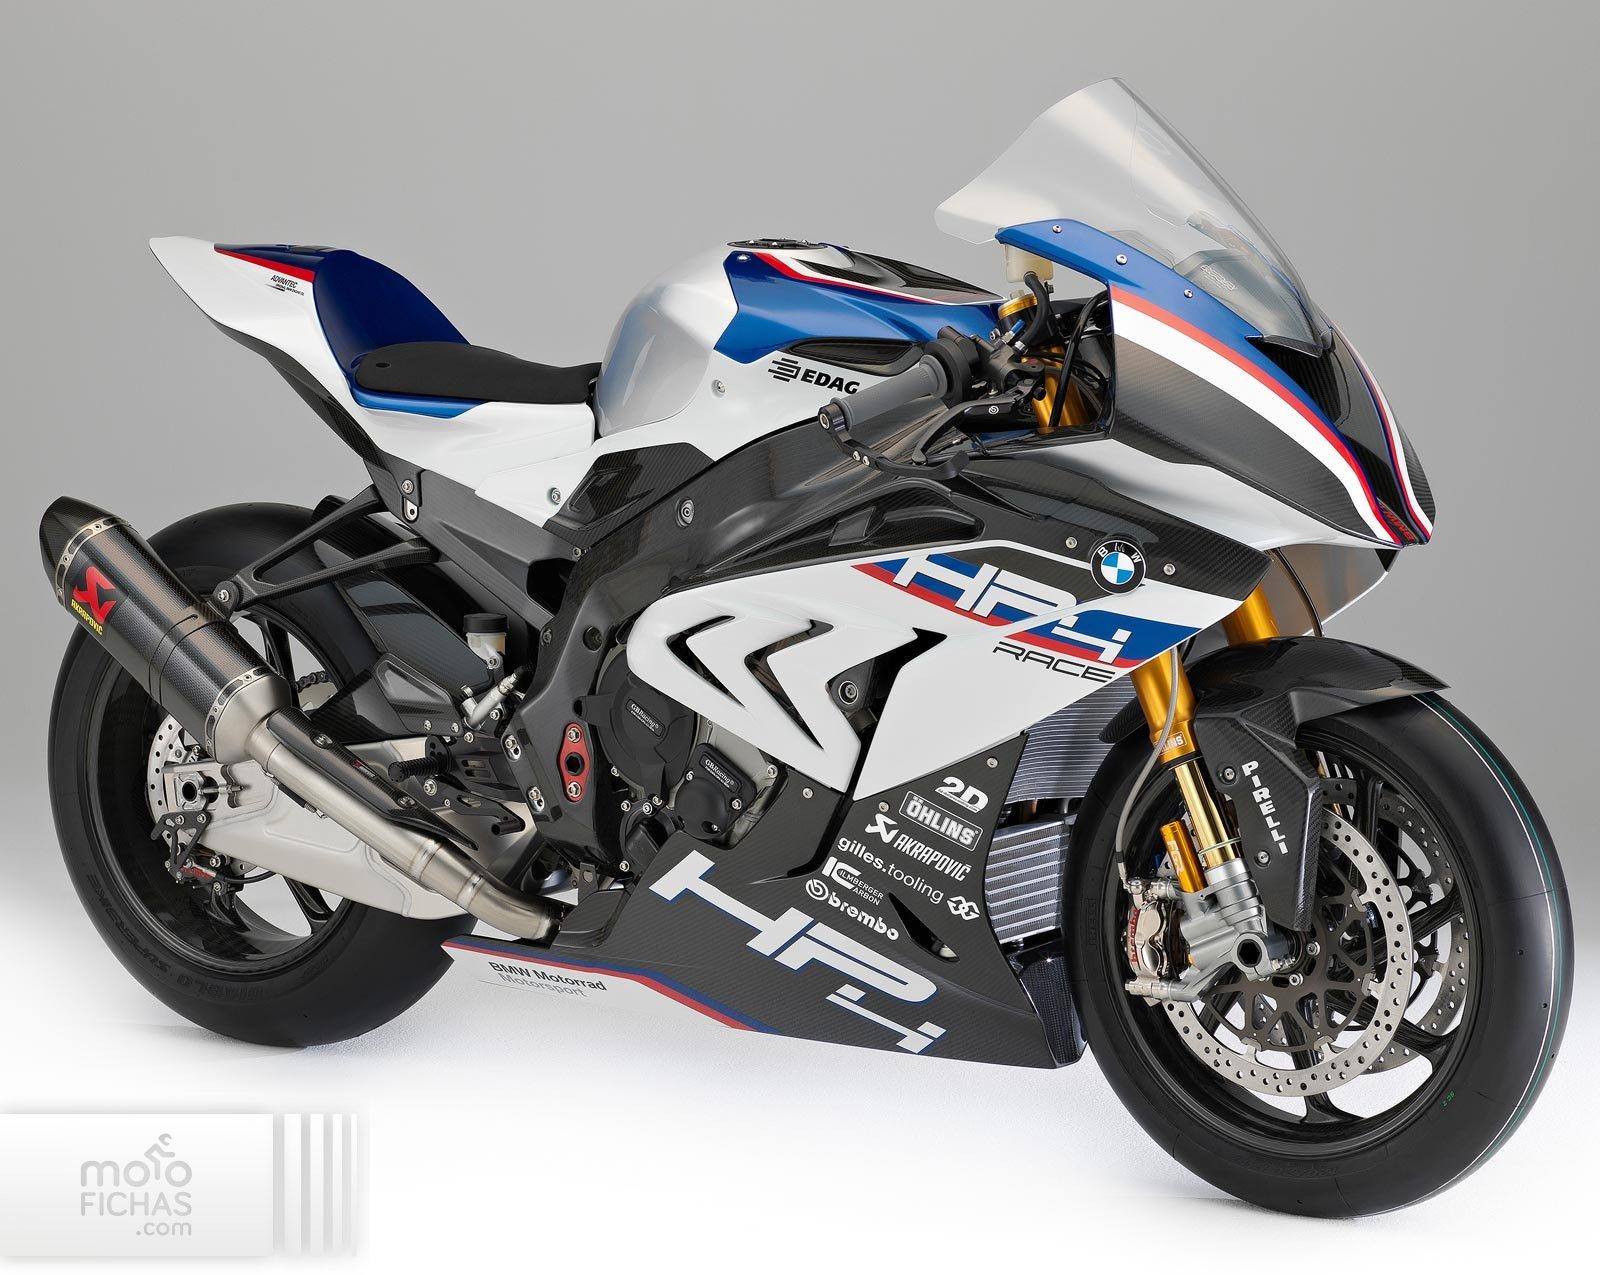 https://www.motofichas.com/images/phocagallery/BMW_Motorrad/HP4_Race/001-bmw-hp4-race-1.jpg